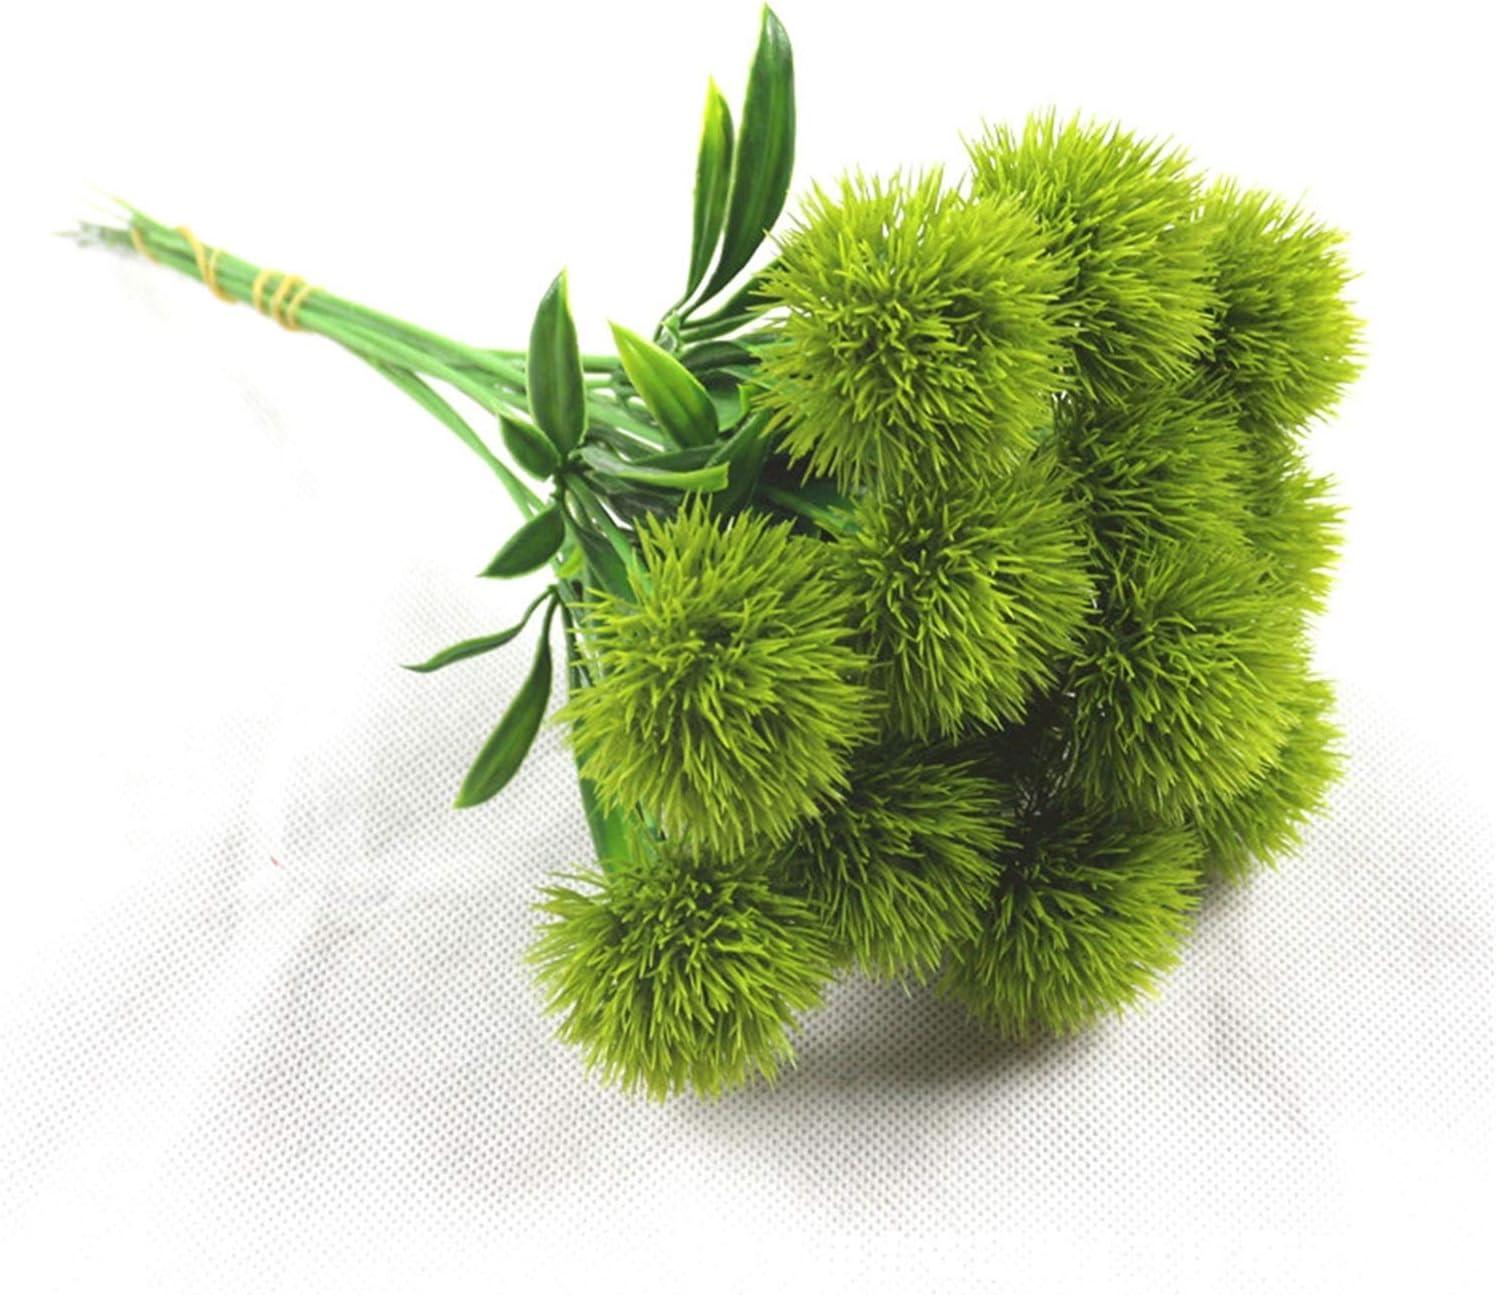 JSJJAES Artificial Flowers Allium Japan In a popularity Maker New 5Pcs Pompon